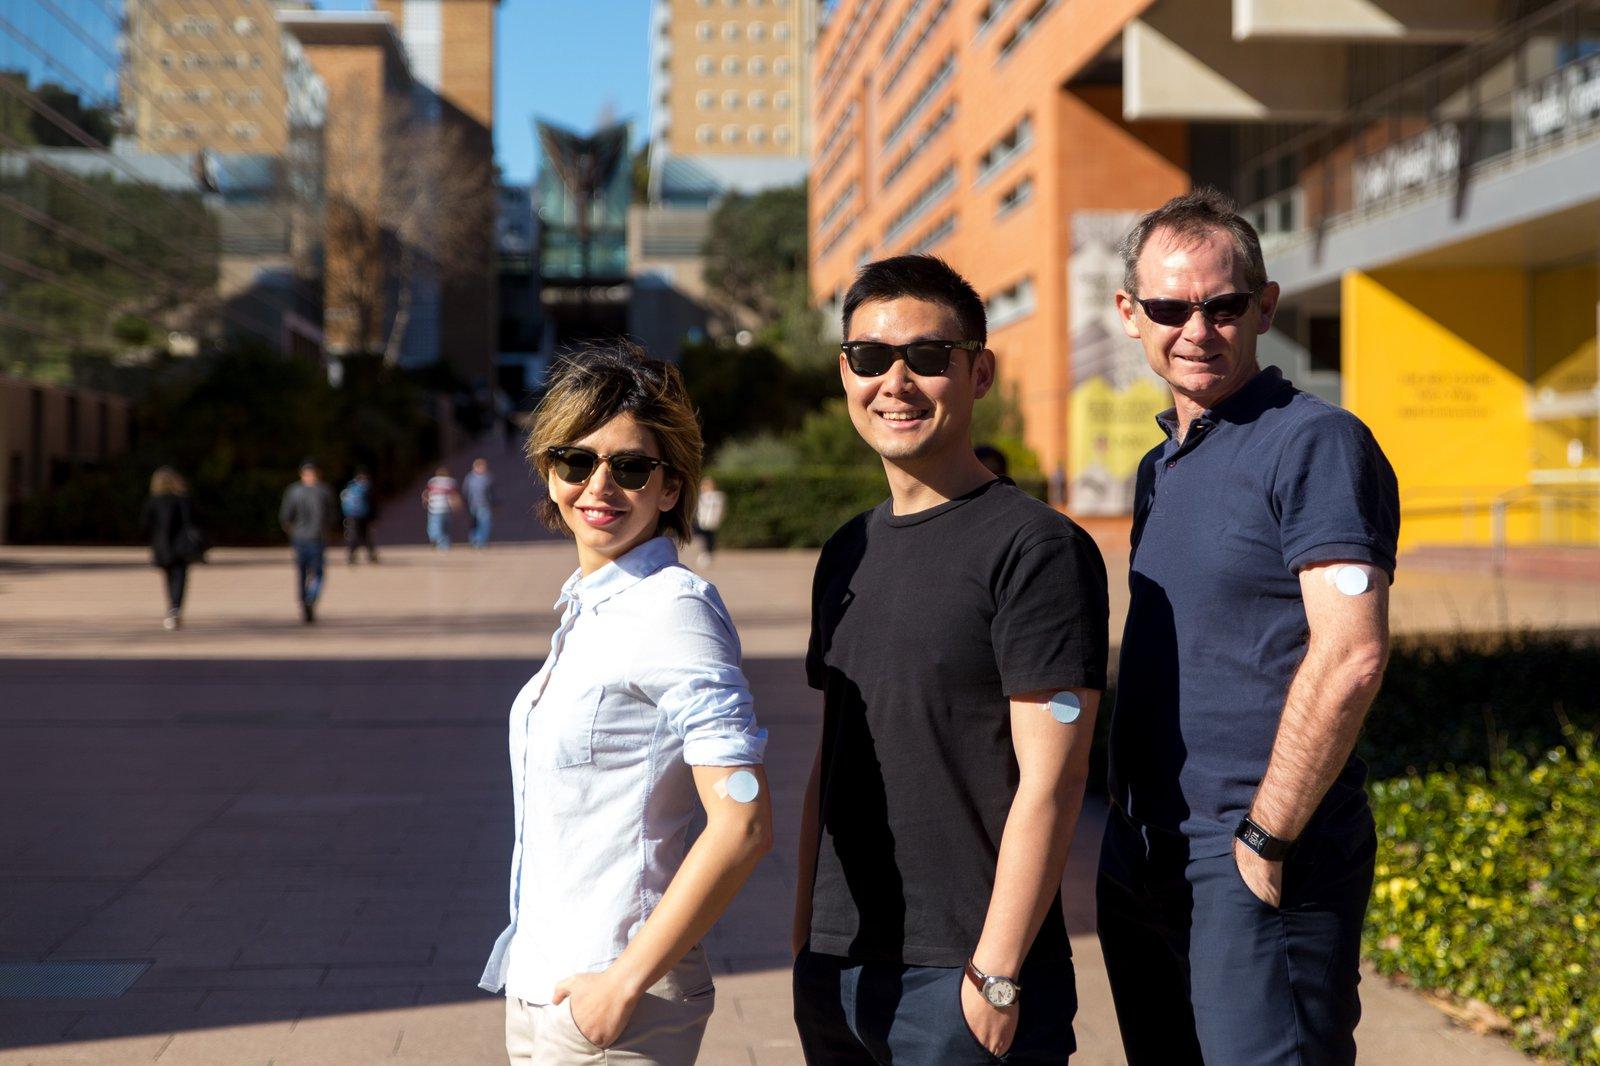 Professor Justin Gooding, Dr Parisa Khiabani and Dr Alexander Soeriyadi